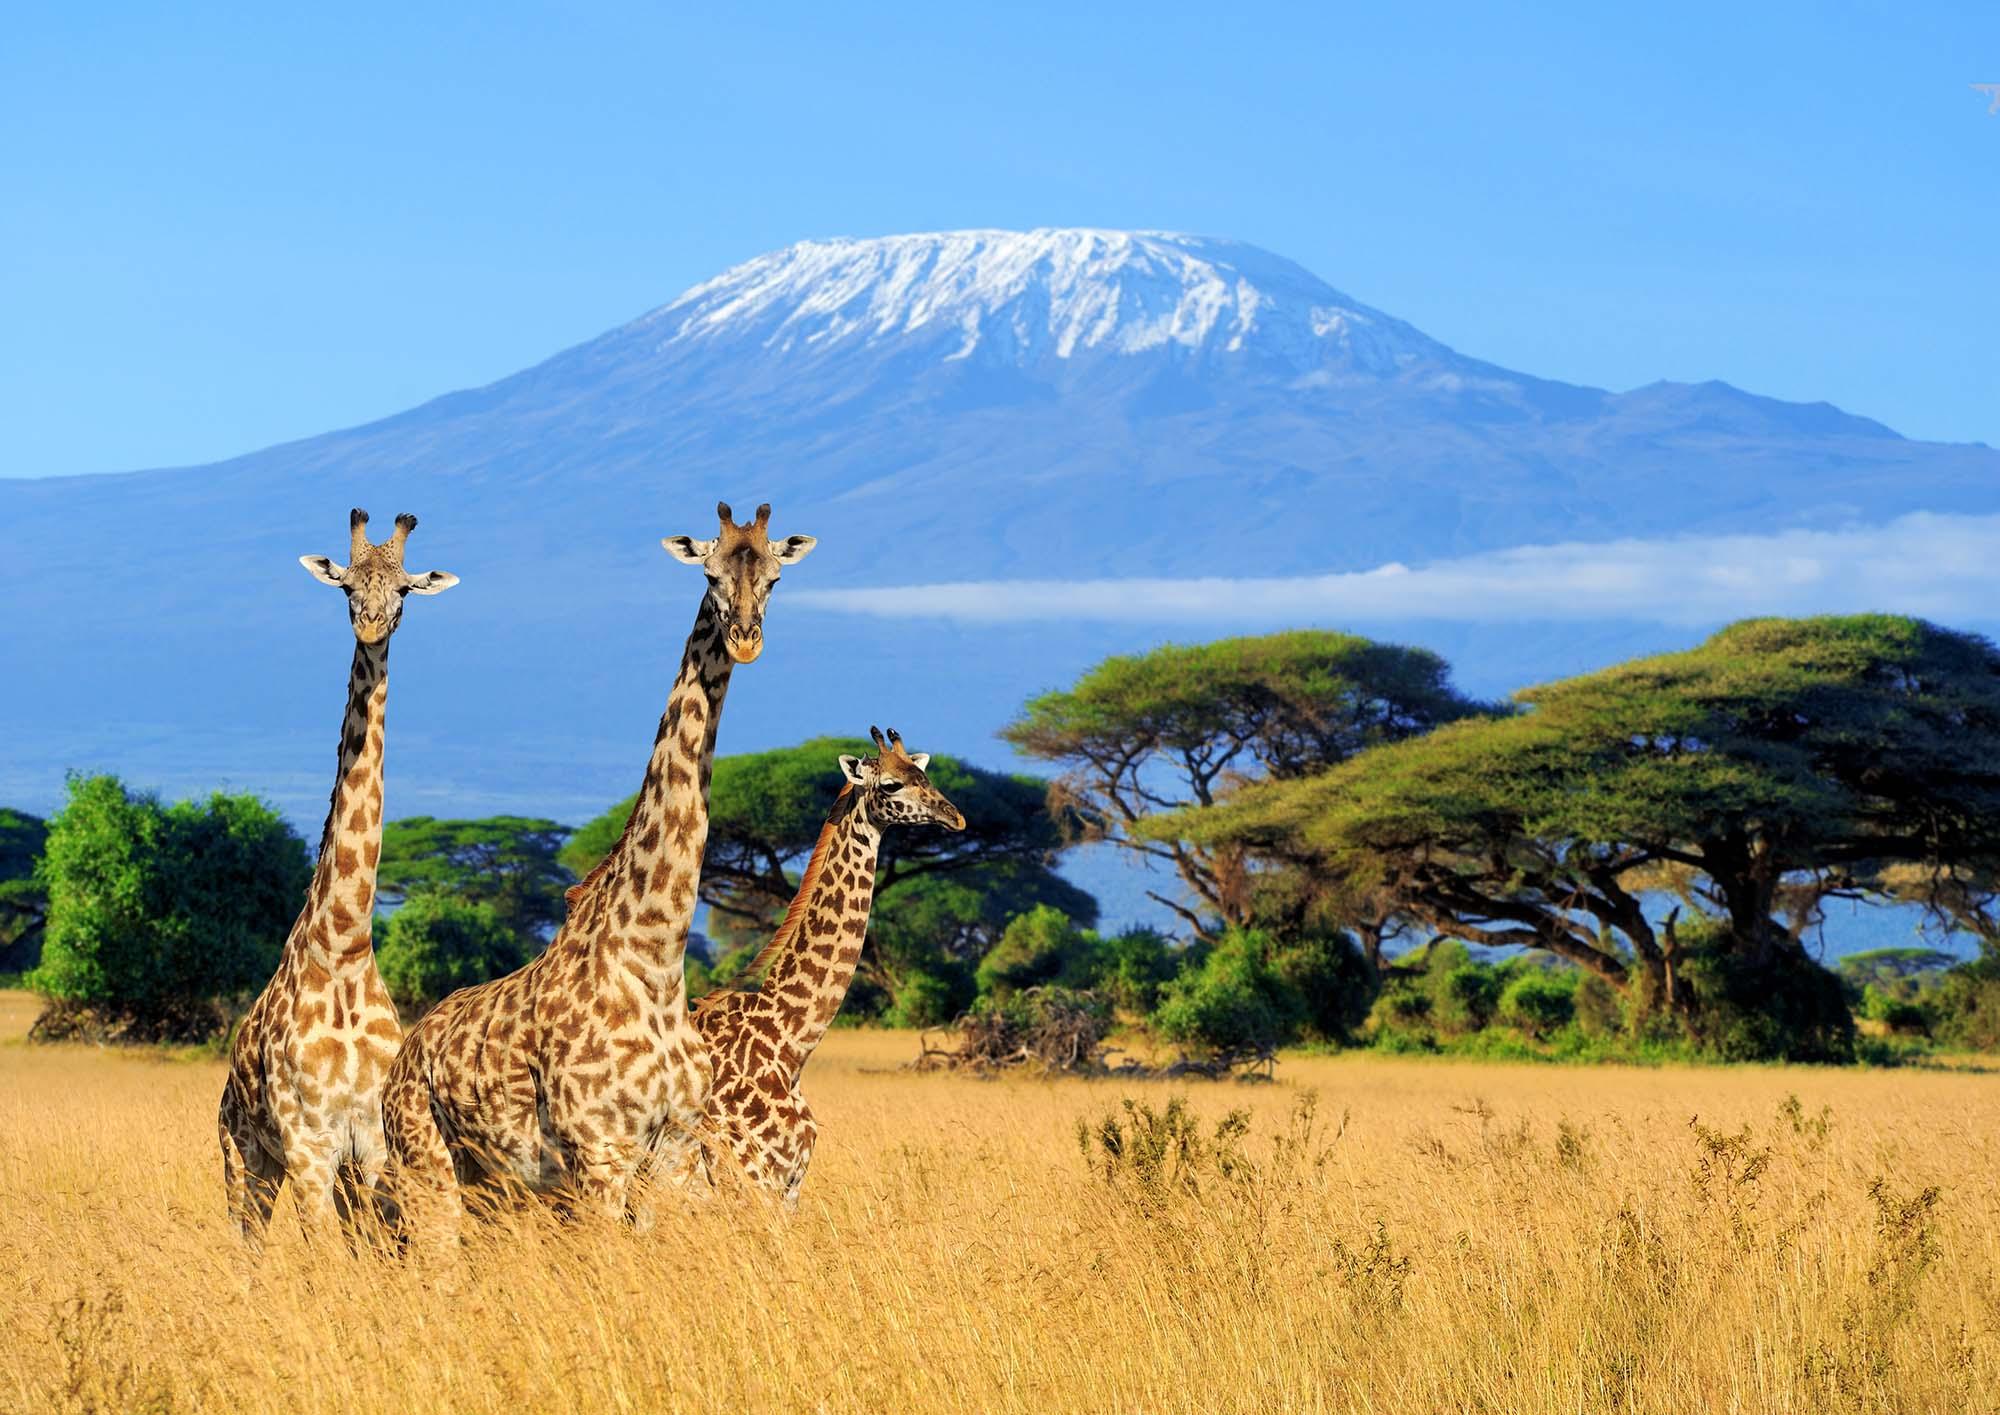 Three,Giraffe,On,Kilimanjaro,Mount,Background,In,National,Park,Of